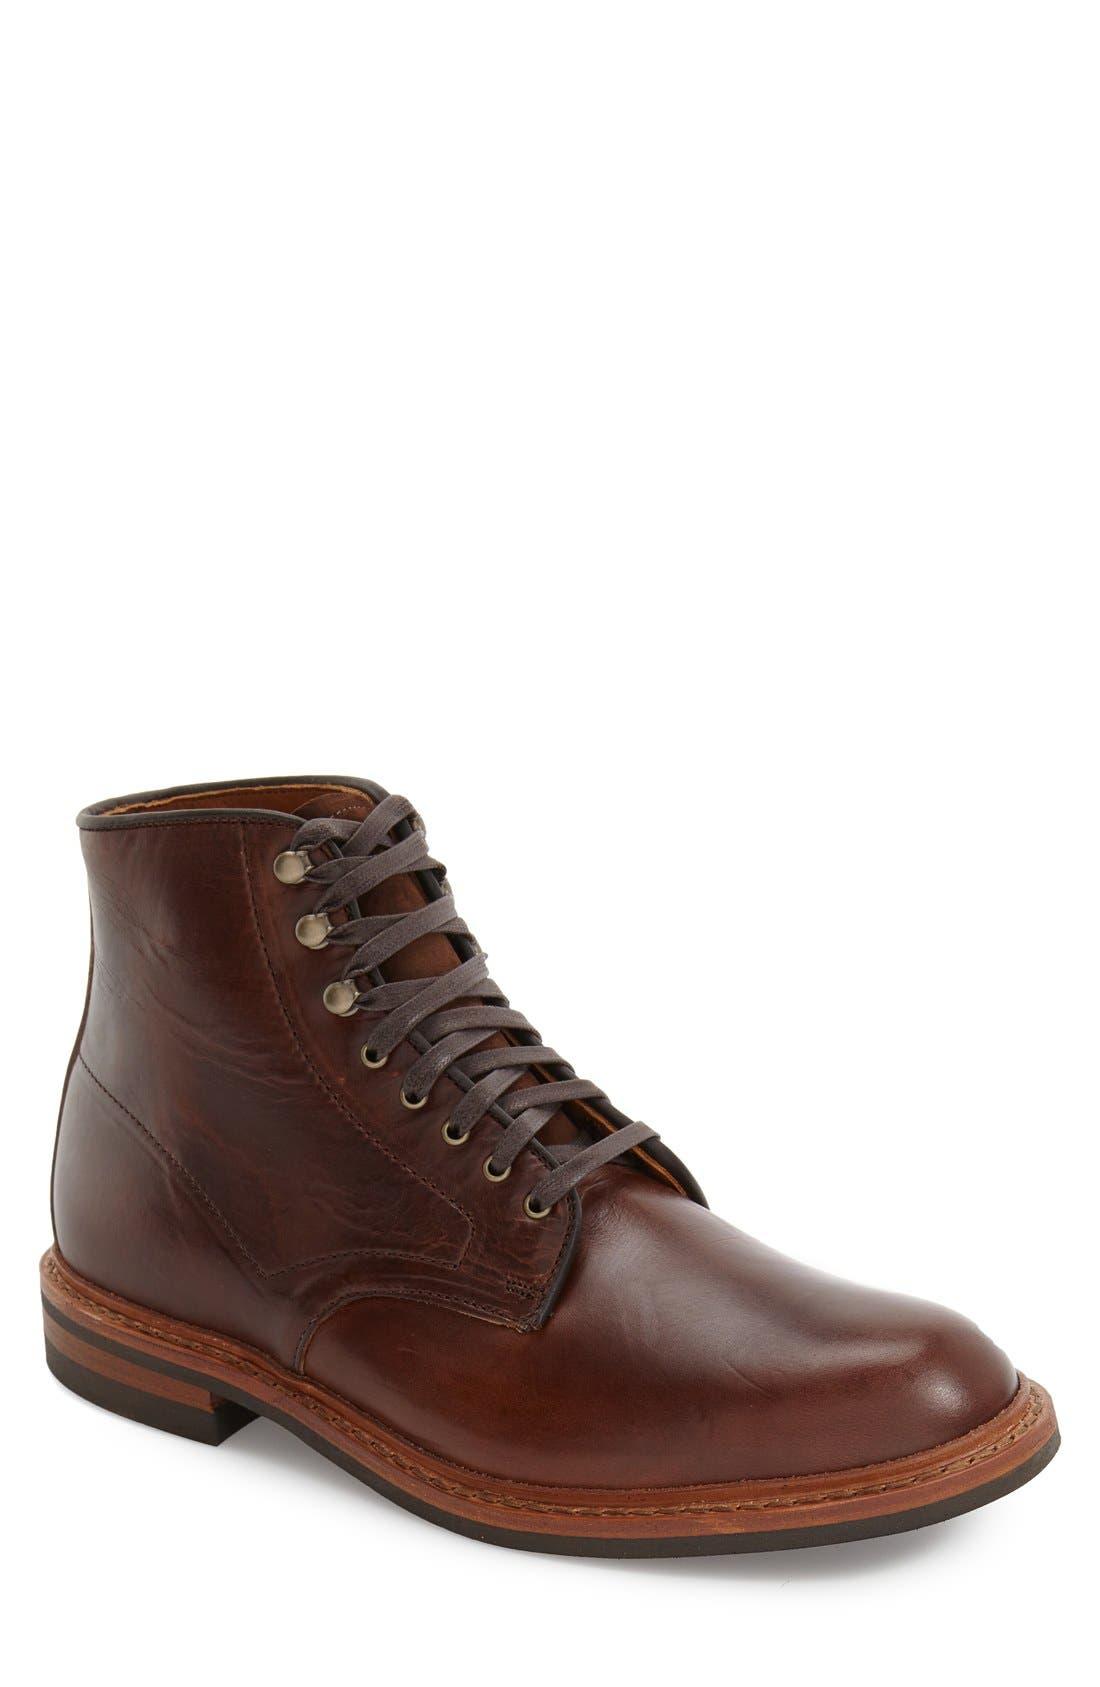 2caf9c0c90b Allen Edmonds  Higgins Mill  Plain Toe Boot